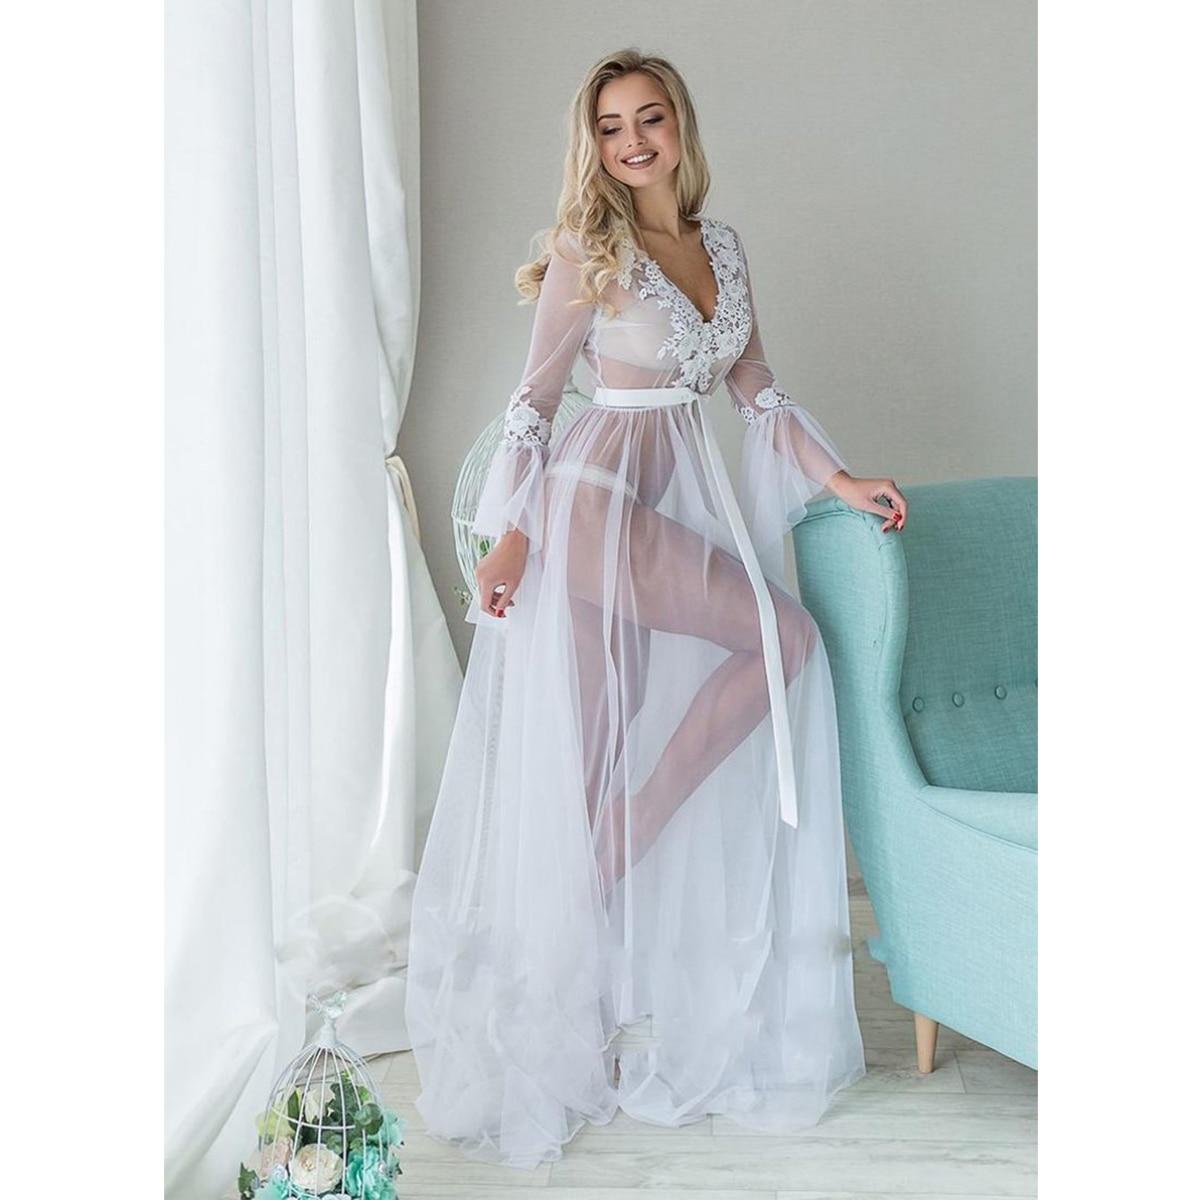 Women Deep V-neck Sexy Exotic Lingerie Dress Long Sleeve Lace Mesh Sheer Nightgown Full-Length Long